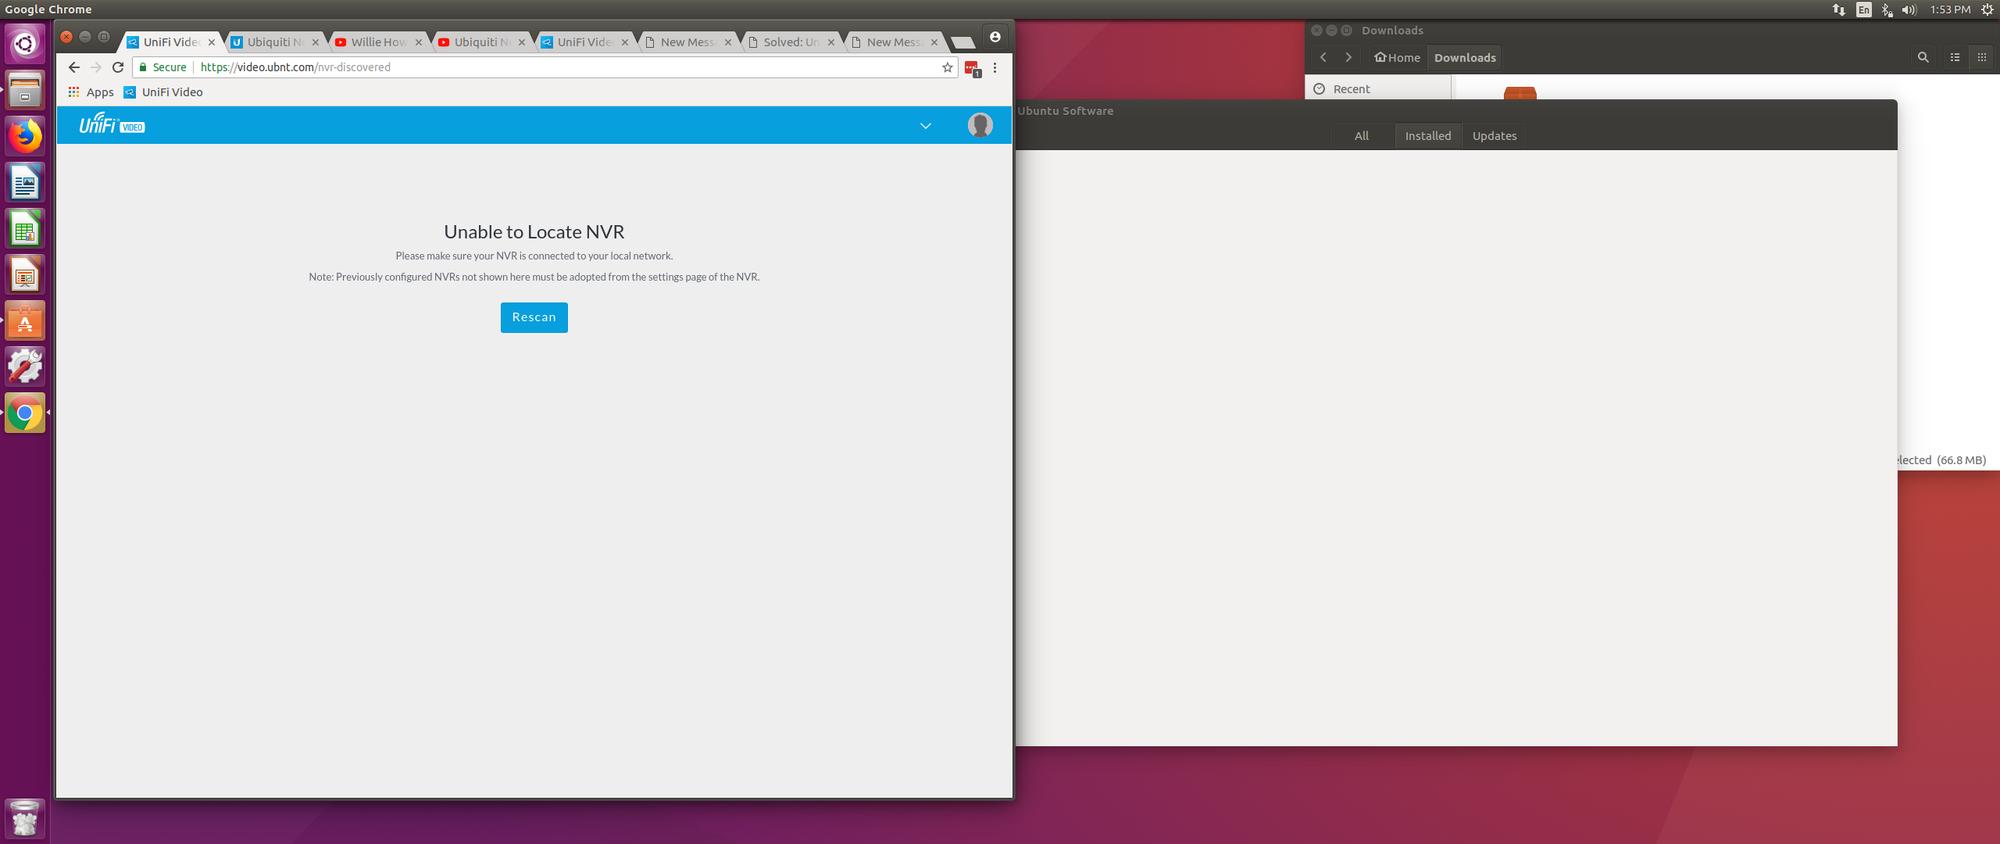 Unifi Video NVR unable to locate NVR Ubuntu 16 04 | Ubiquiti Community